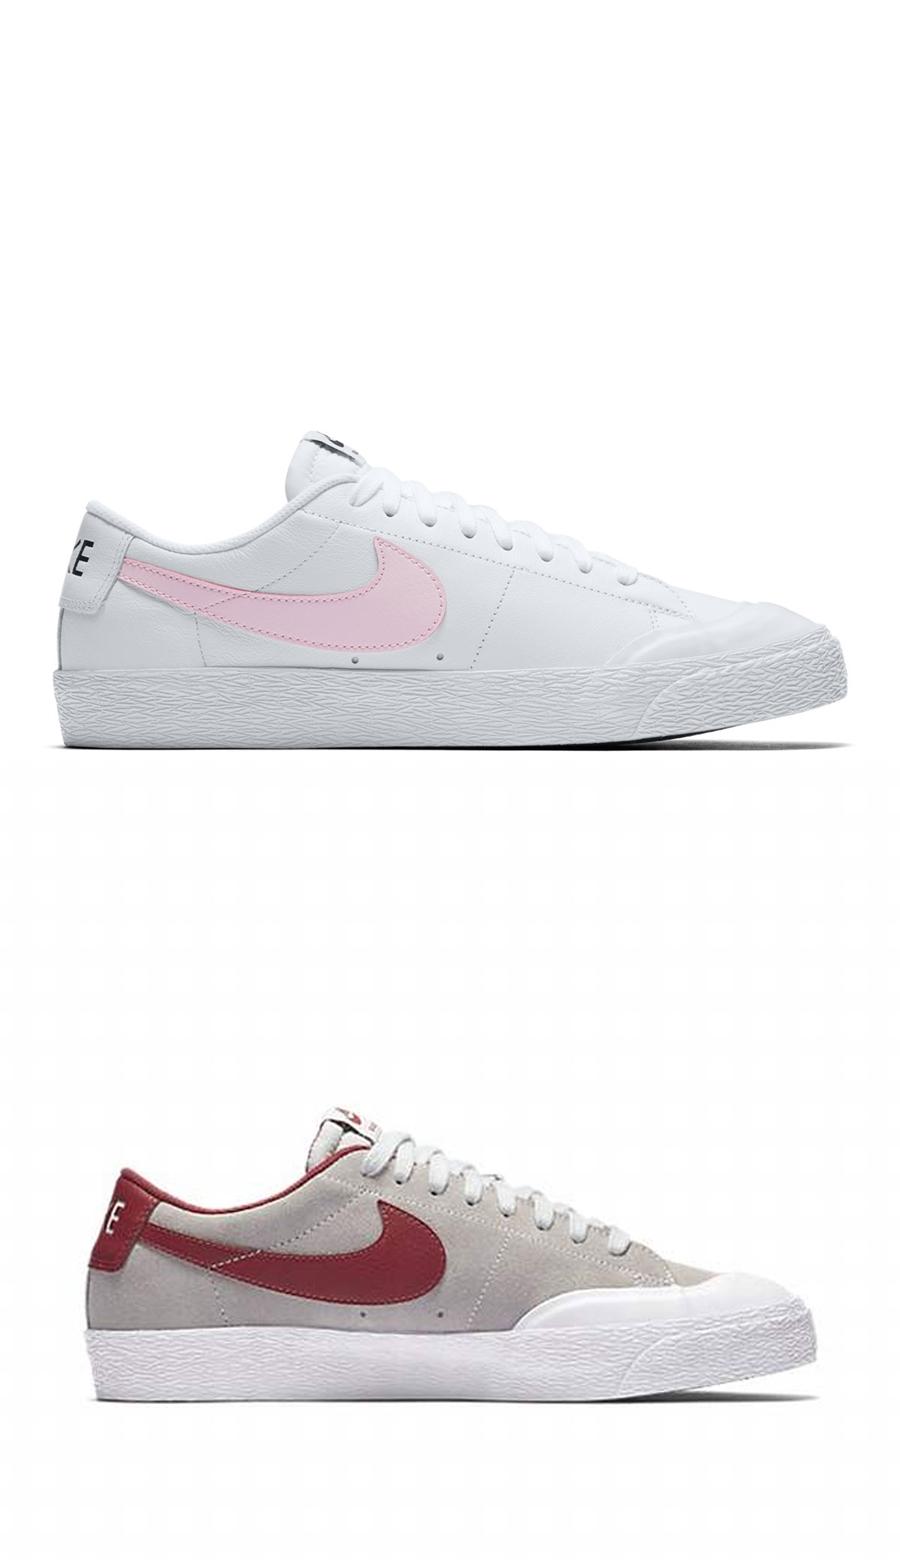 ec4428ecc4afb Homme chaussure sneaker NIKE SB BLAZER ZOOM LOW XT 864348